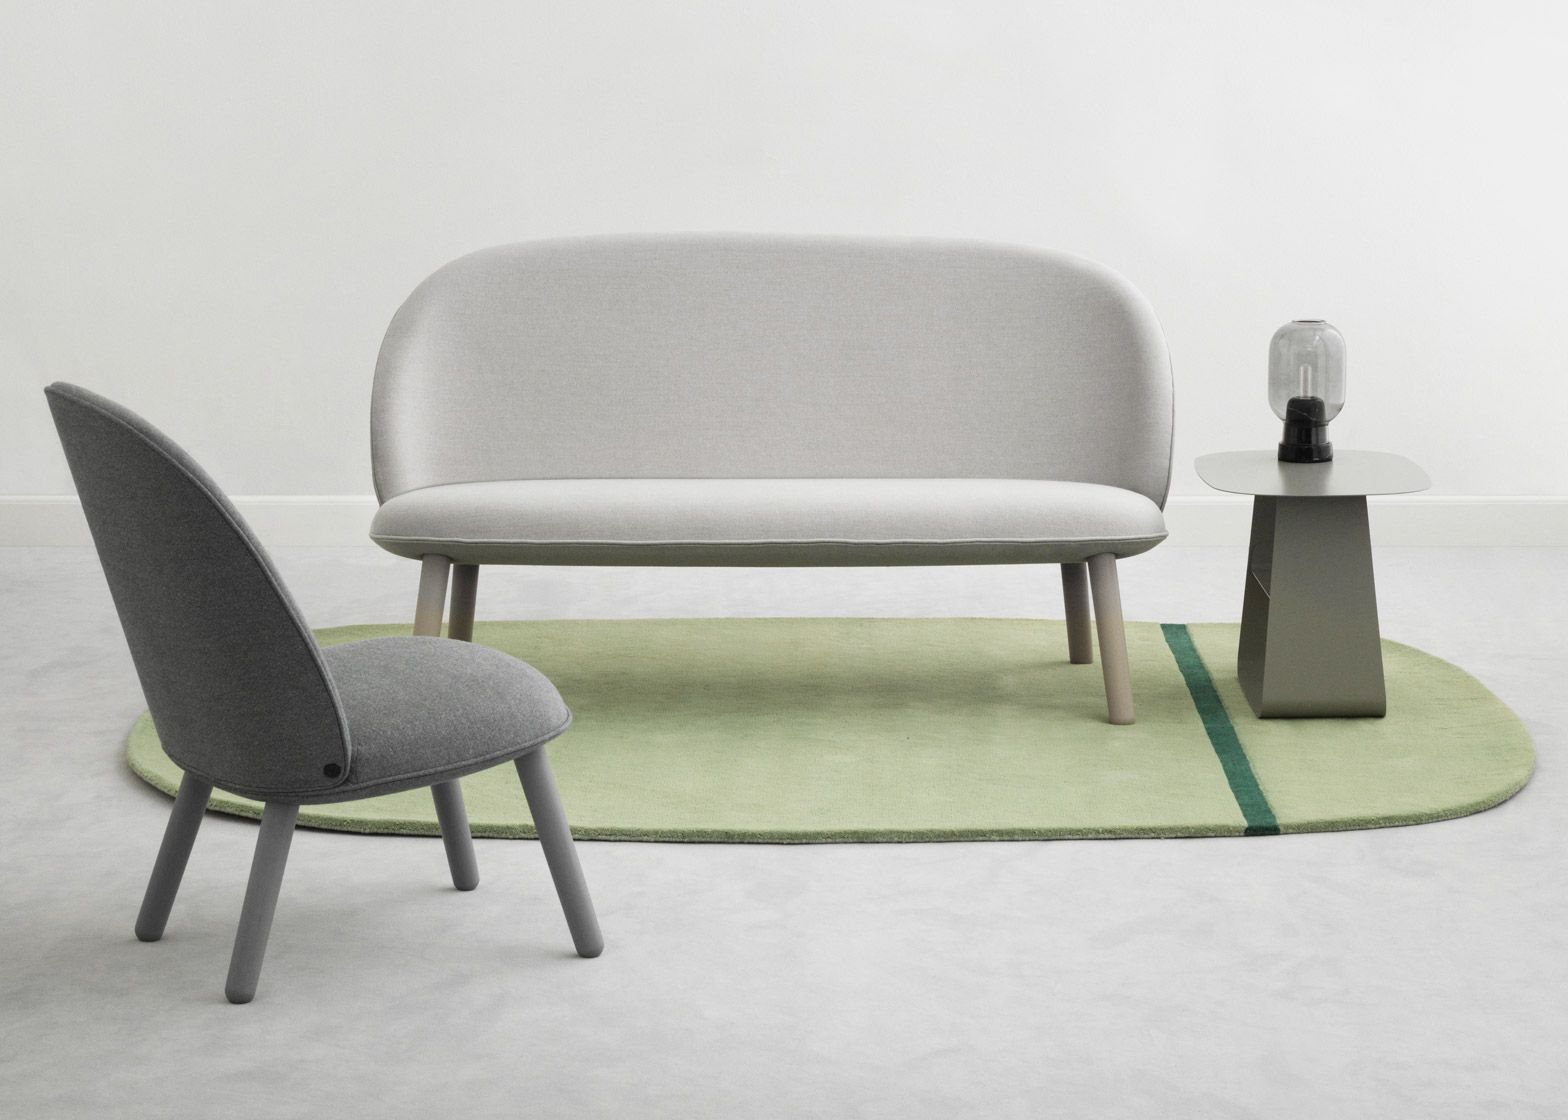 Strange Pin By Kenmura Jeng On Living Furniture Chair Machost Co Dining Chair Design Ideas Machostcouk